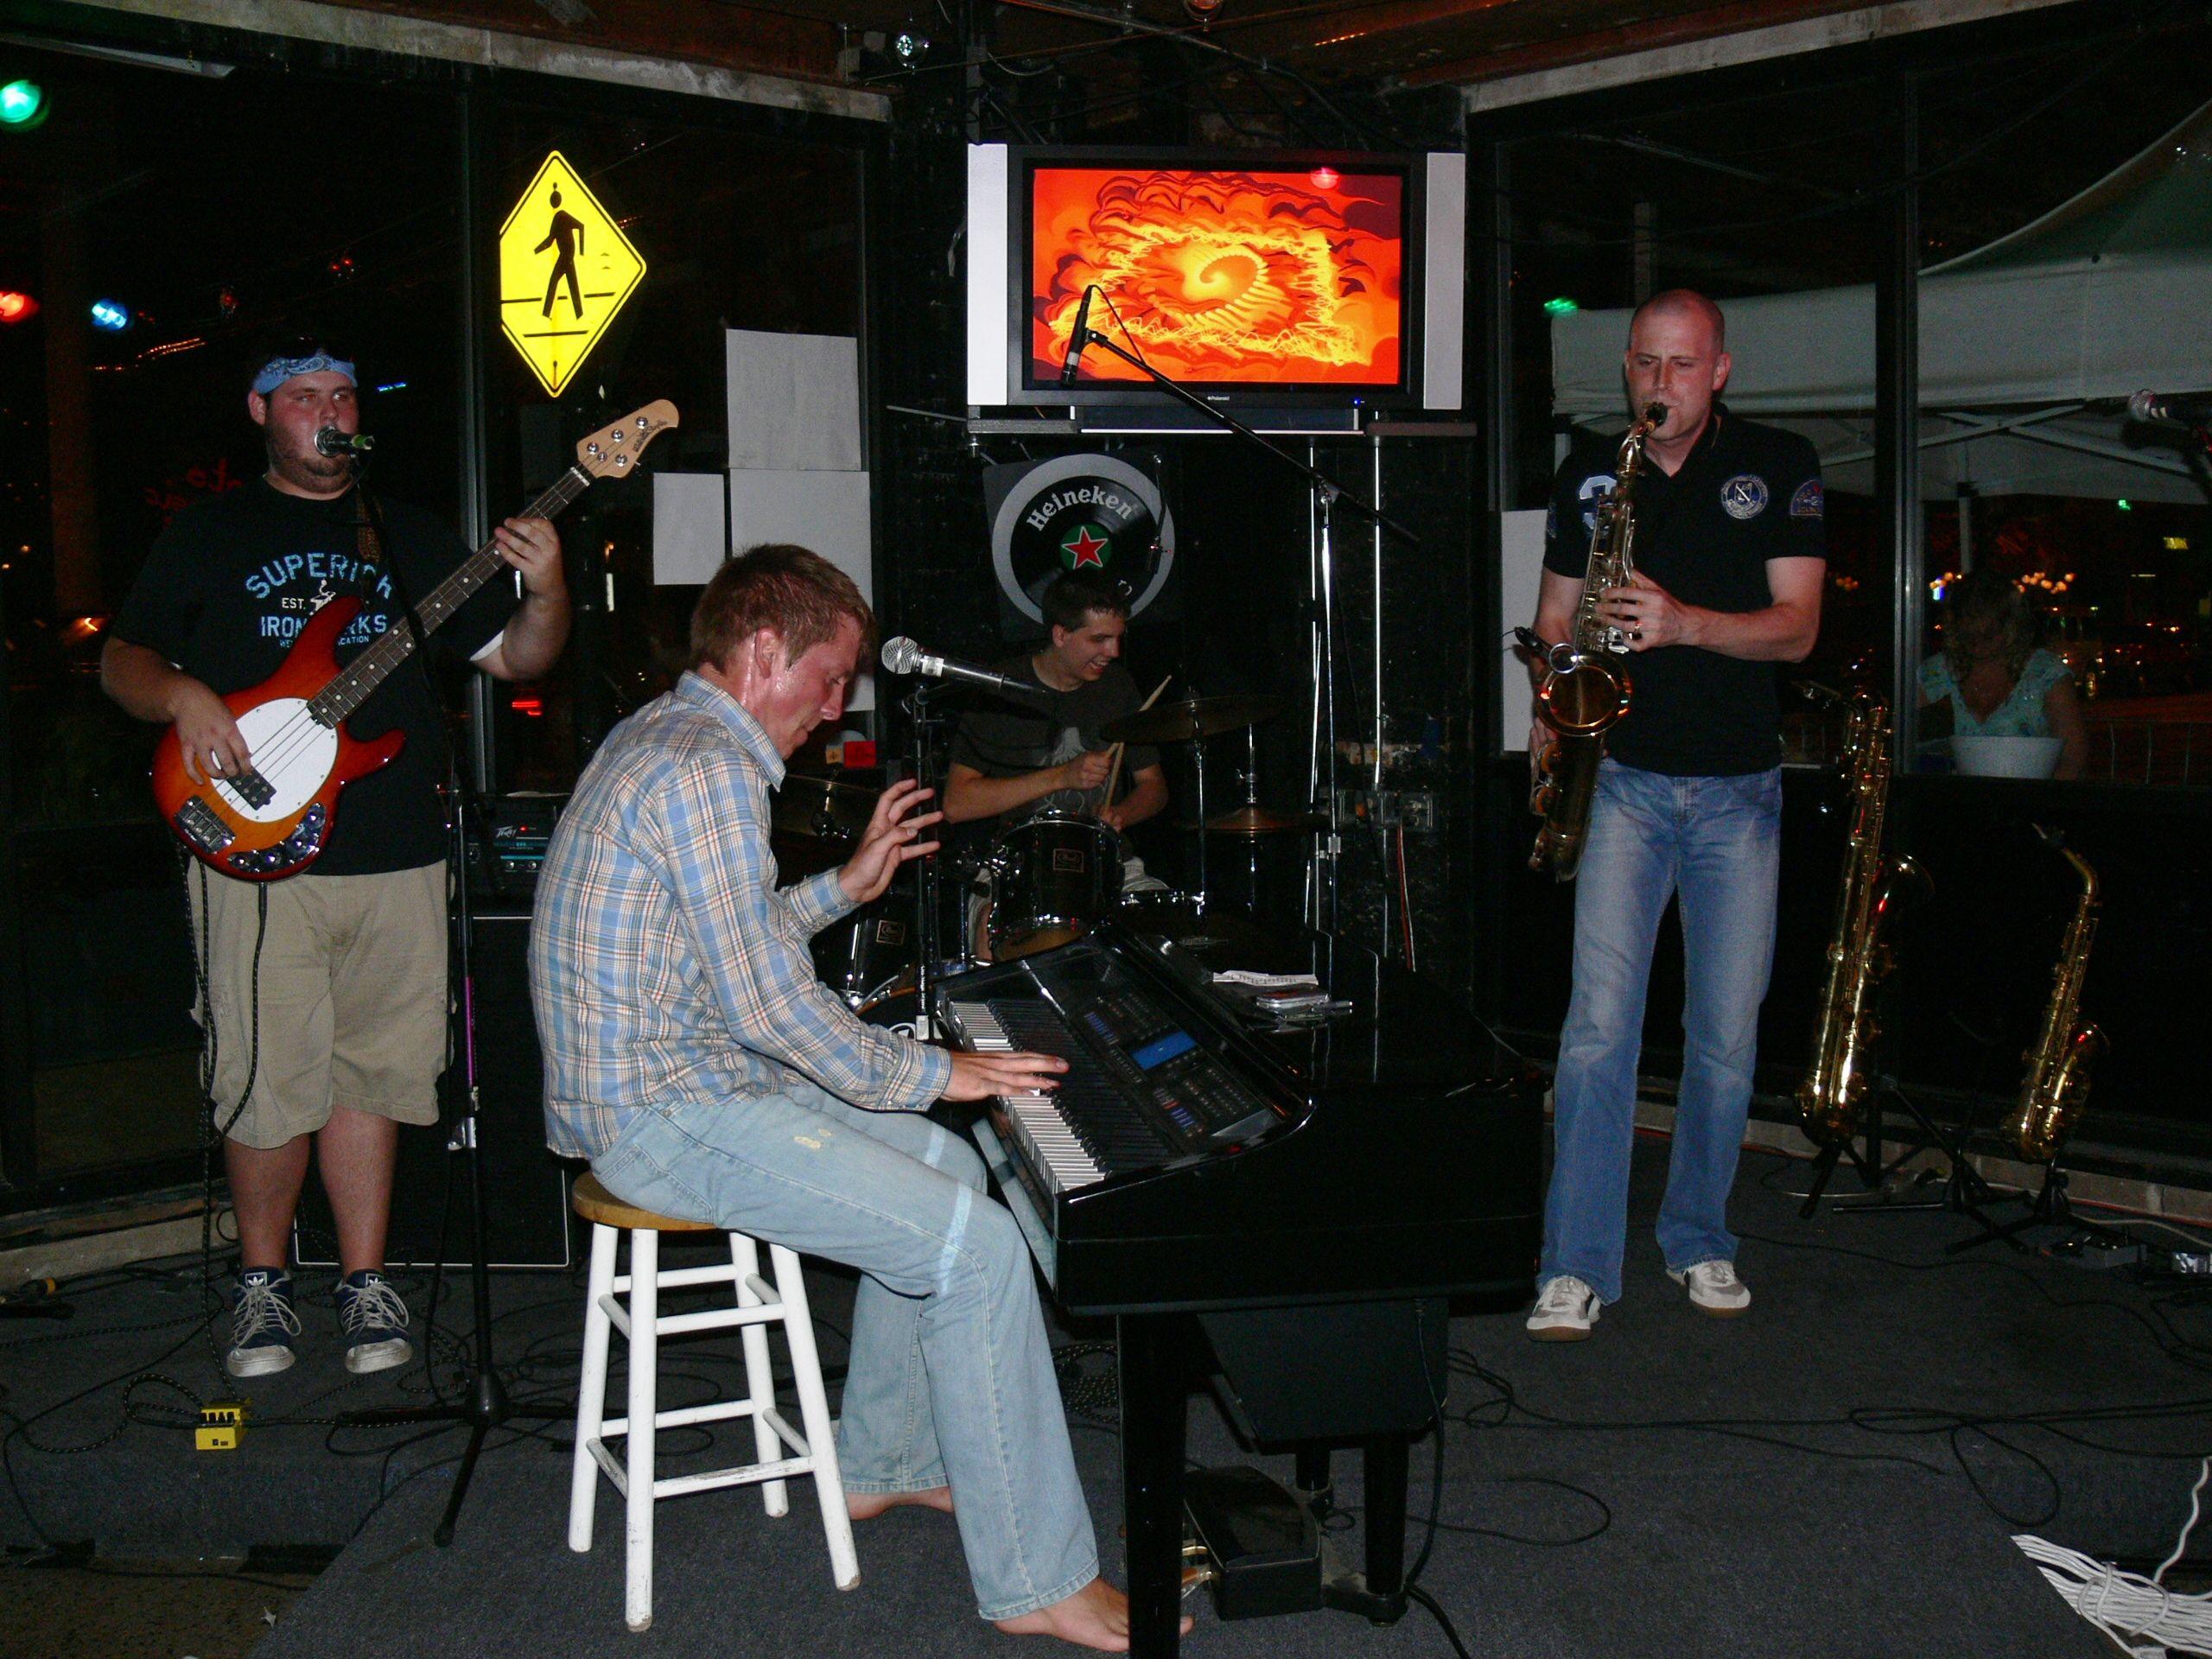 July 6th, 2007 - Gig 163 – Kryptonite – Rockford, IL – 10:30-11:30pm